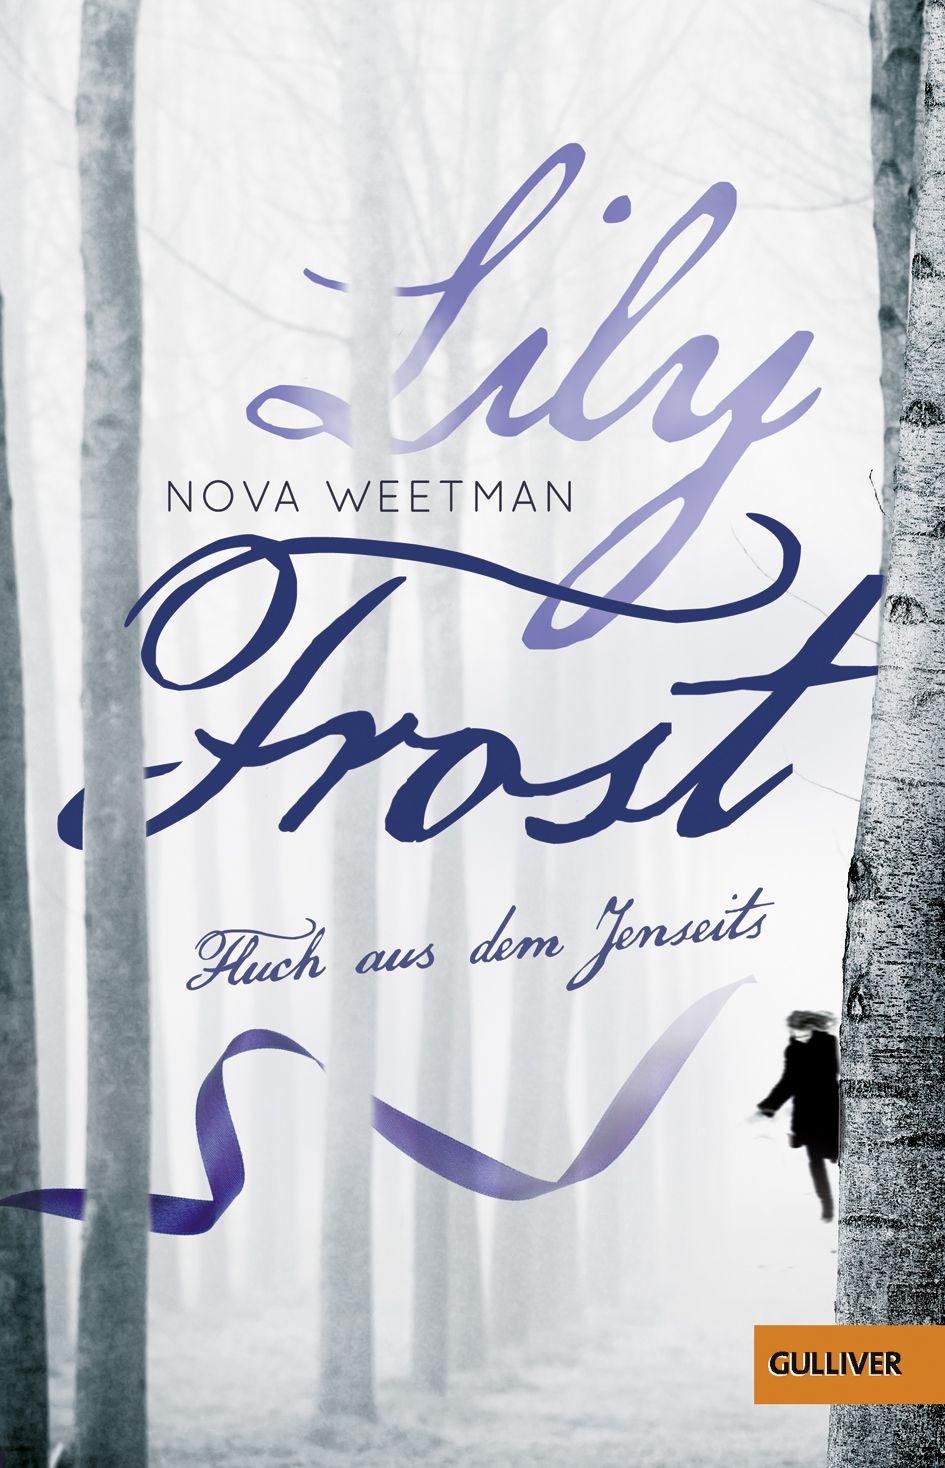 Book-addicted: [Rezension] Nova Weetman - Lily Frost - Fluch aus ...